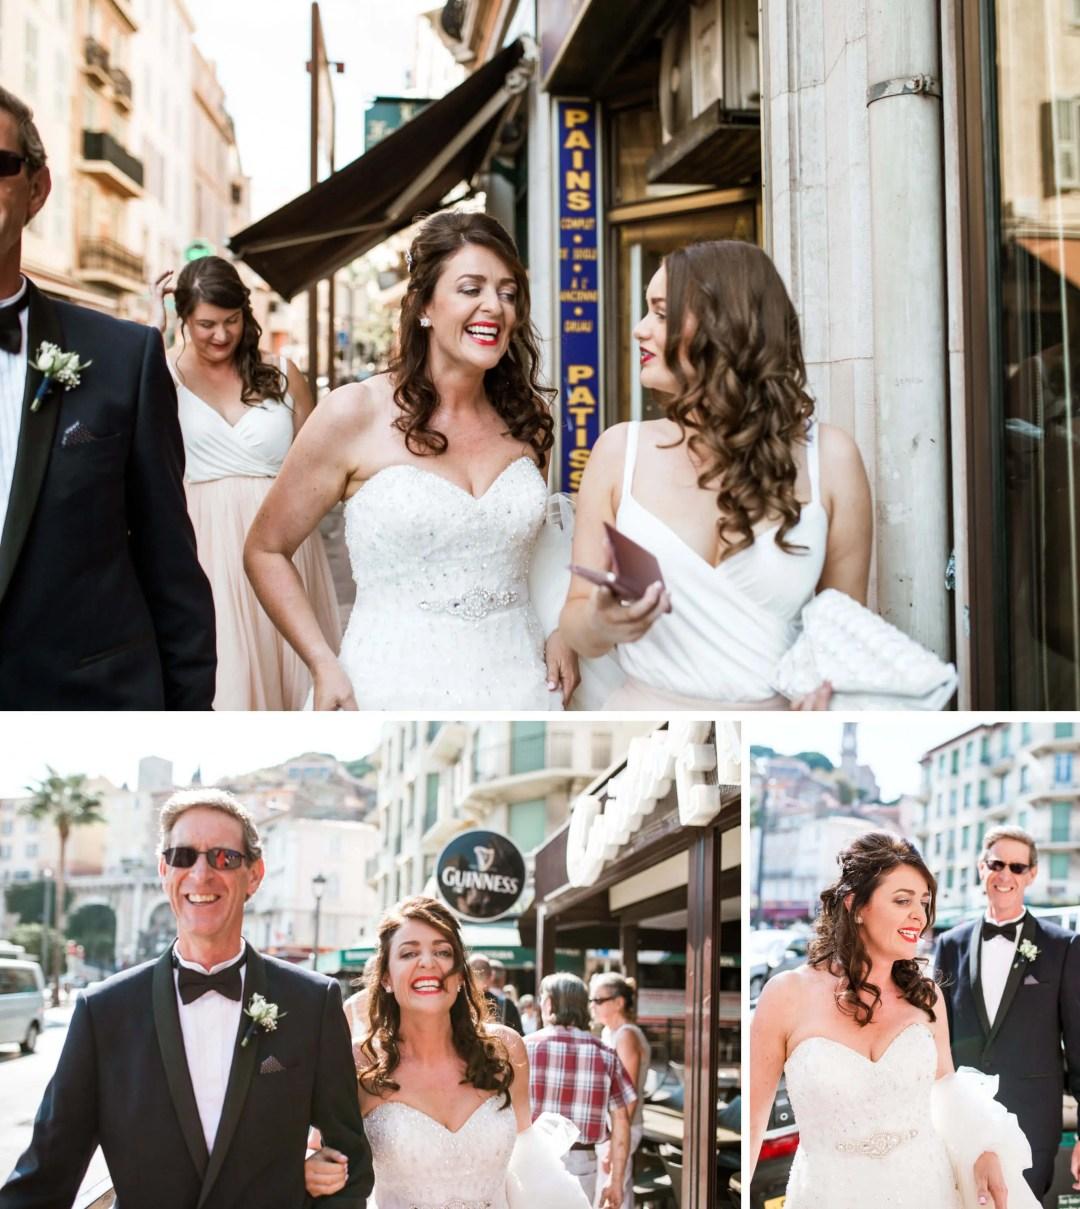 bride-destination-wedding-photographer-in-cannes-la-mairie-town-hall